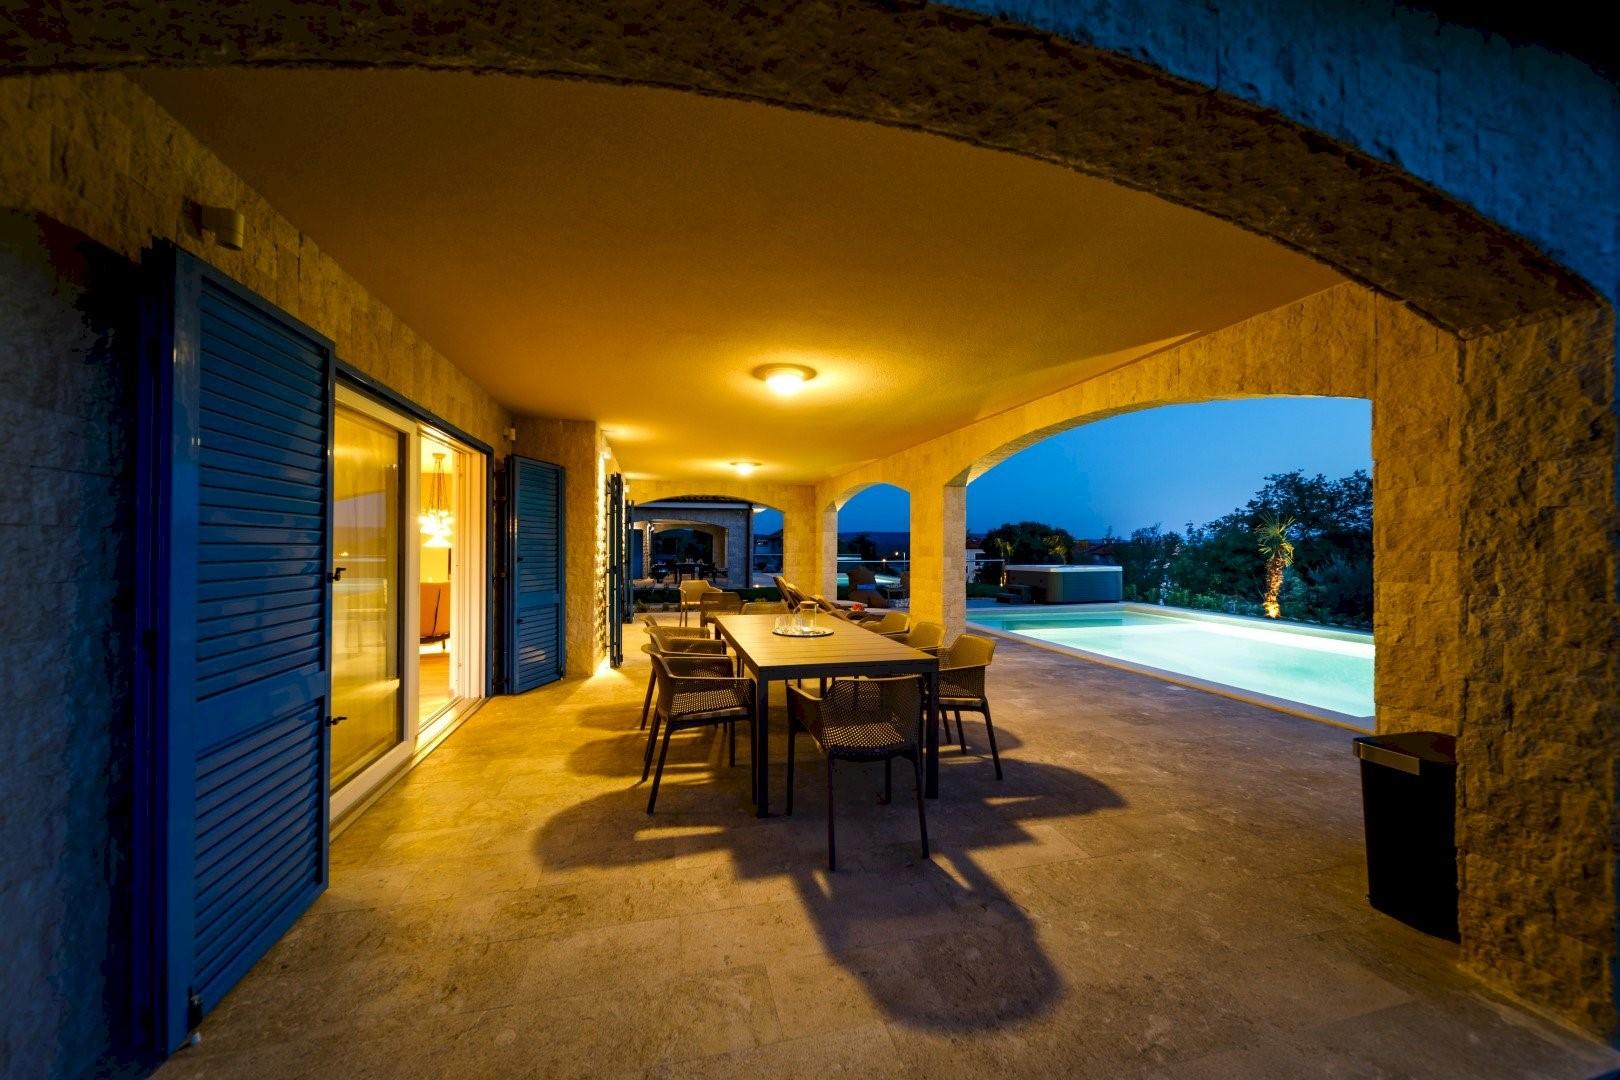 Ferienhaus Luxury Villa Loma 1 (2586644), Sveti Vid-Miholjice, Insel Krk, Kvarner, Kroatien, Bild 25